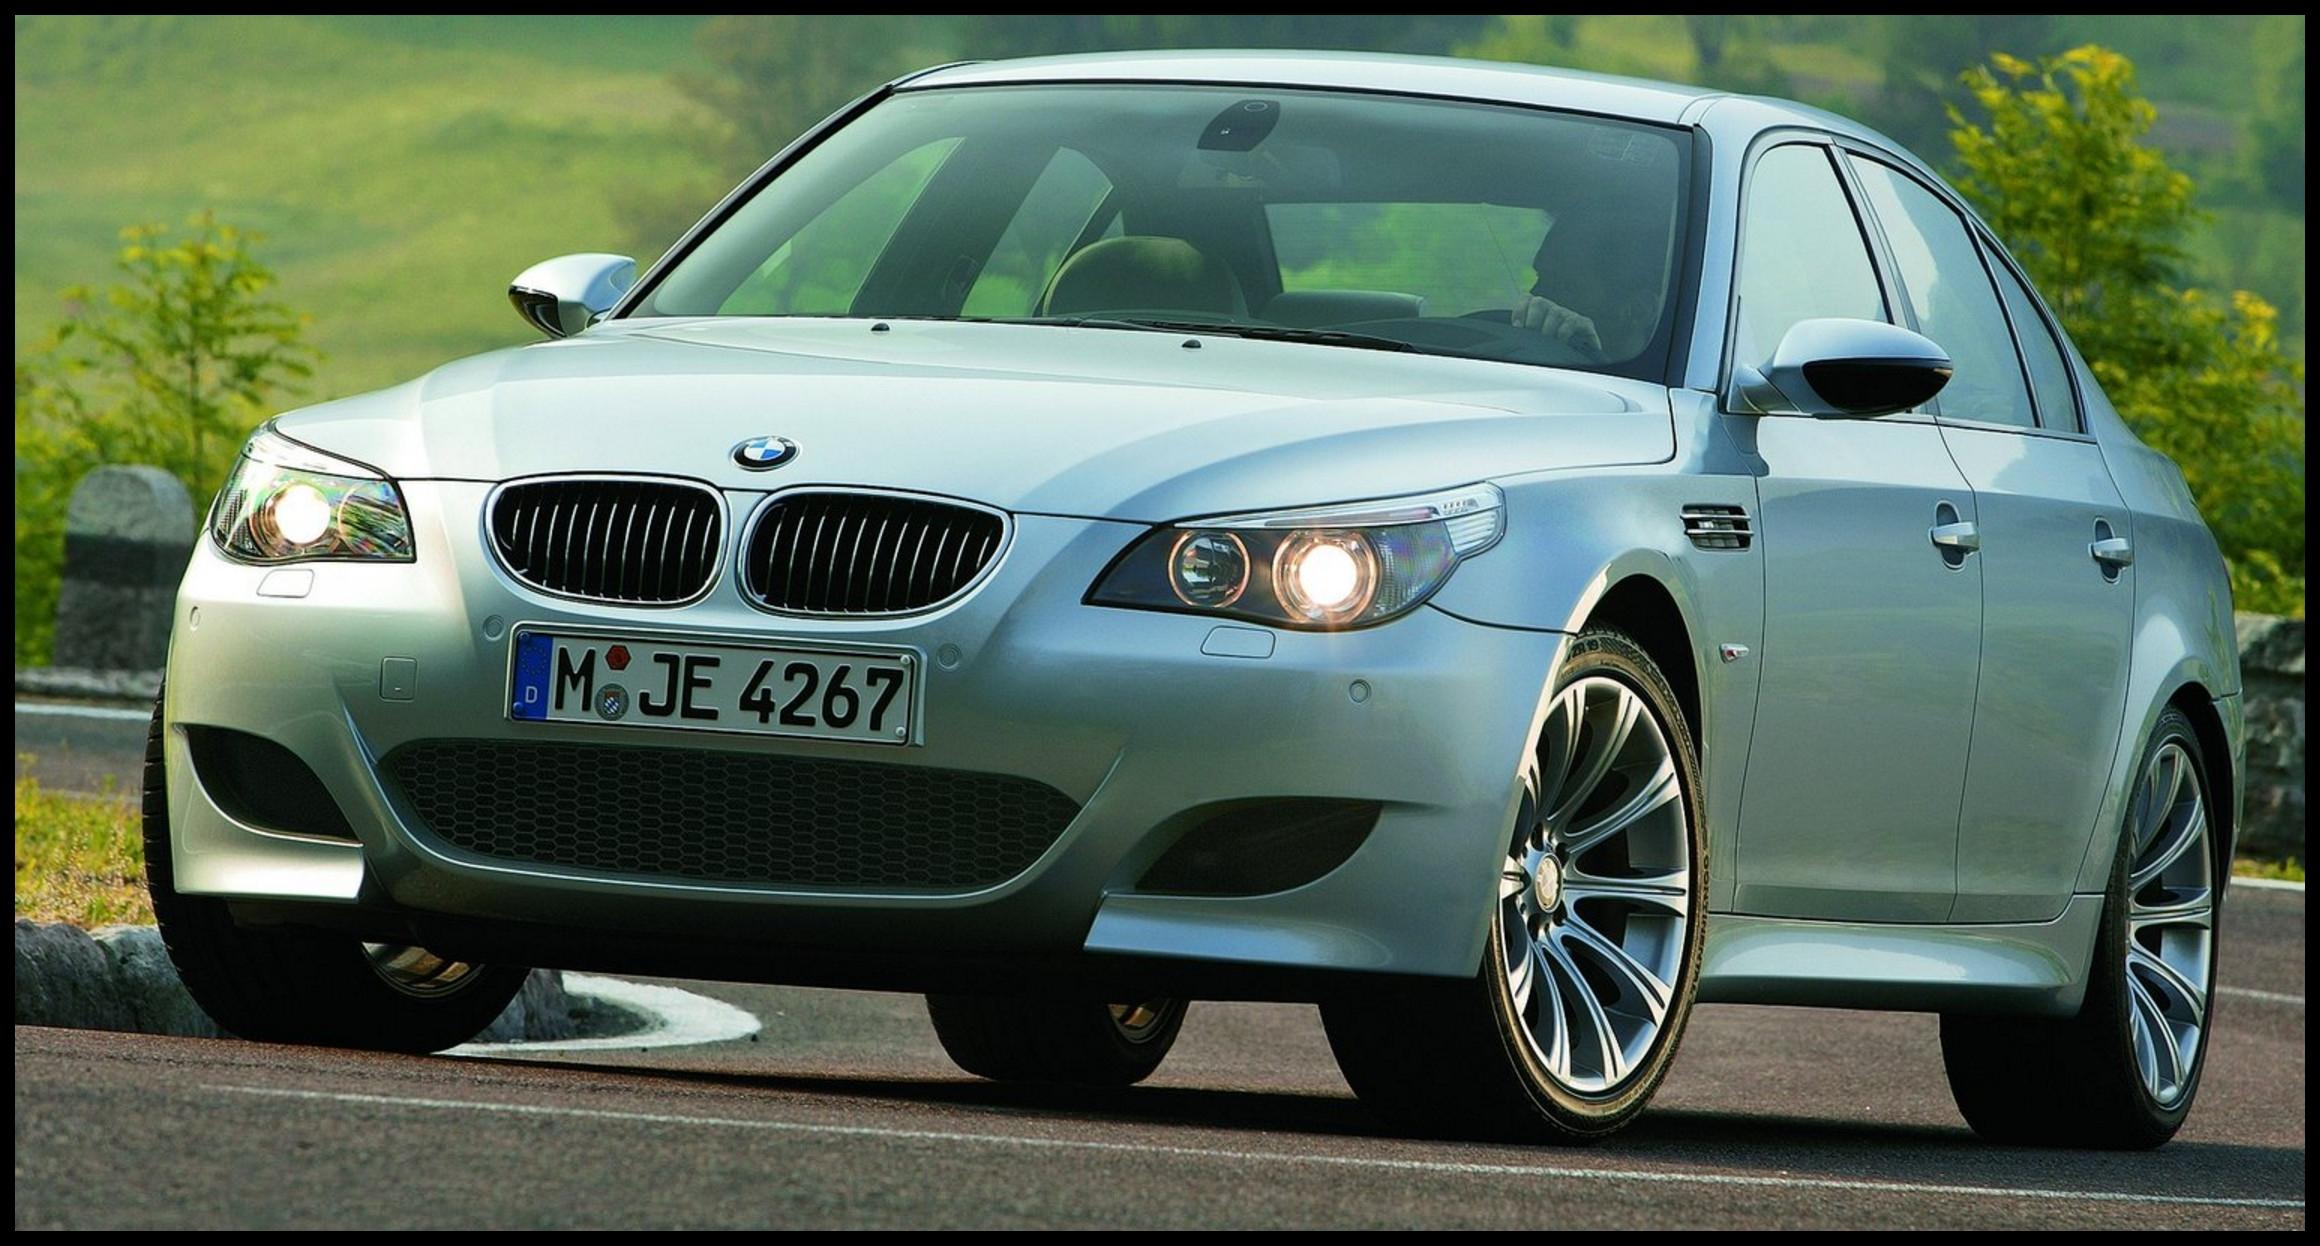 Bmw M5 0 60 Elegant Lovely 2016 M5 0 60 Bmw M5 0 60 Luxury